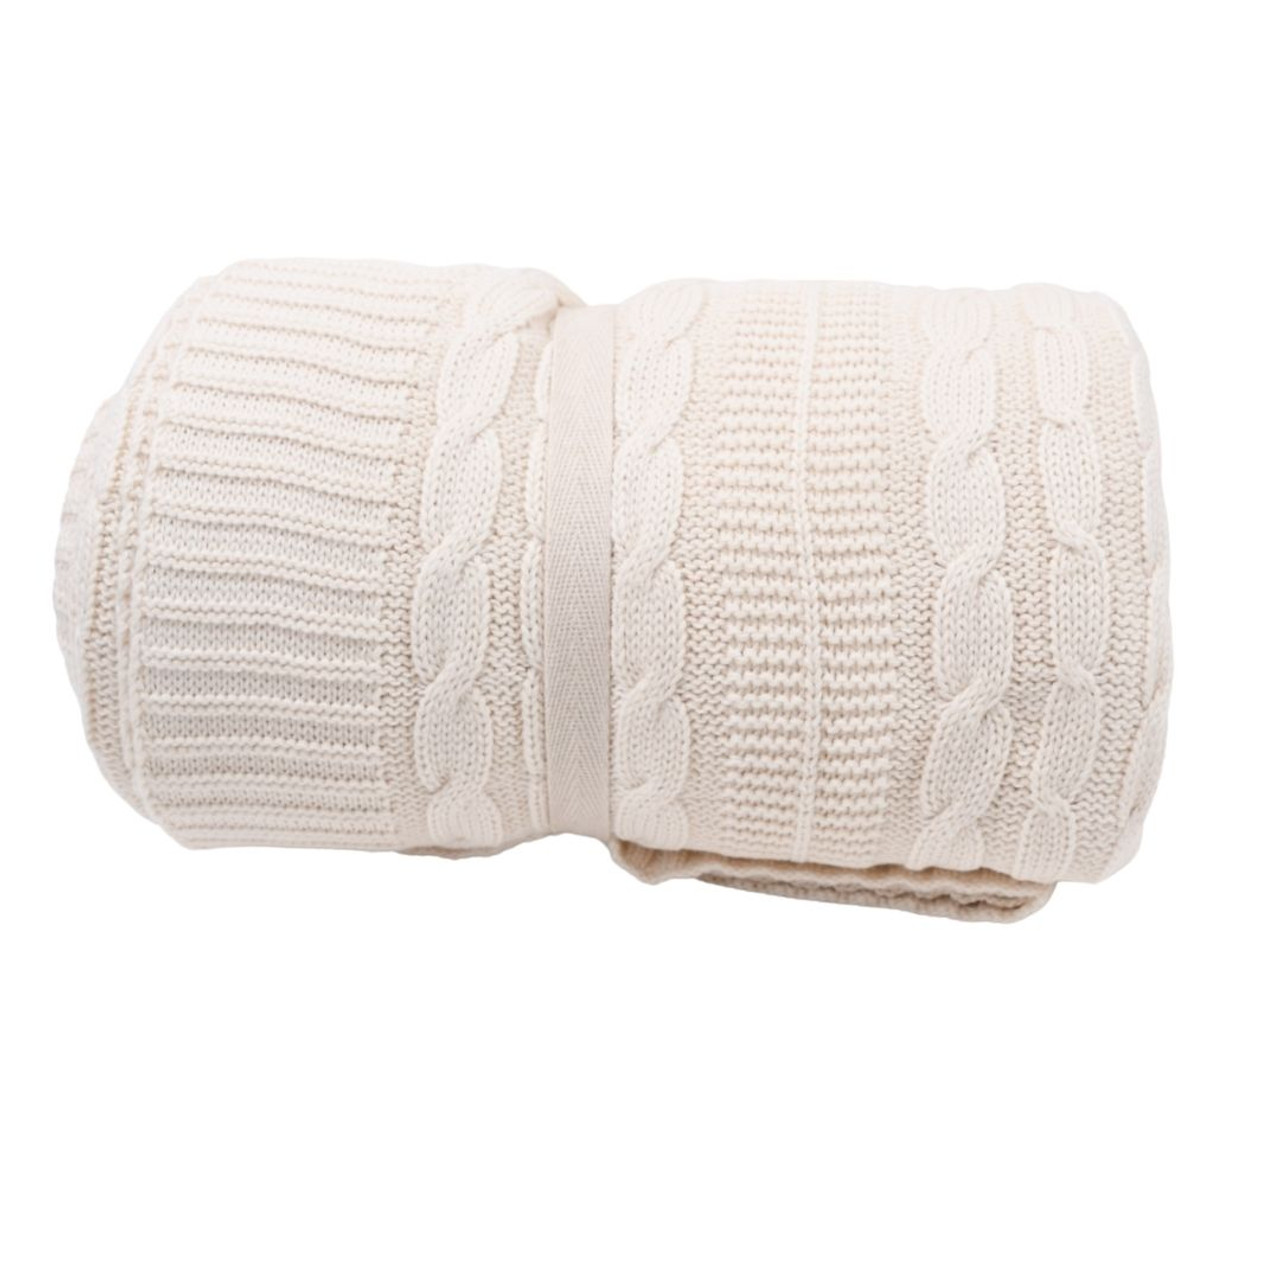 Organic Throw Blanket - Cream